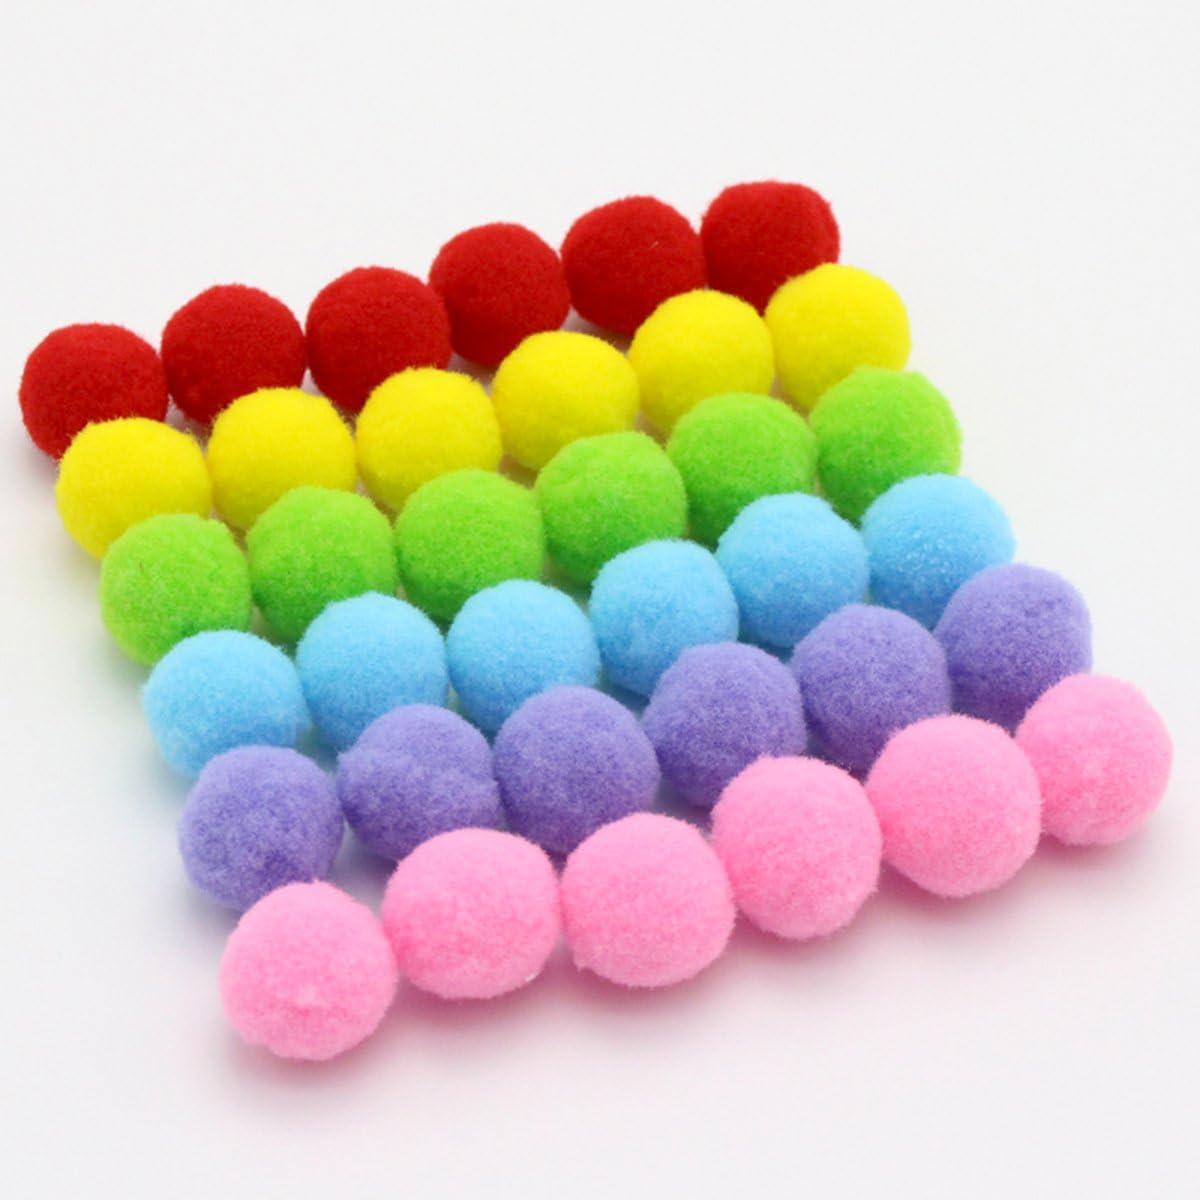 UEETEK 160pcs 3.5/cm juguetes de gato Surtido de Colores douces gato juguete bolas gatito Juguetes pomp/ón bolas color de mezcla